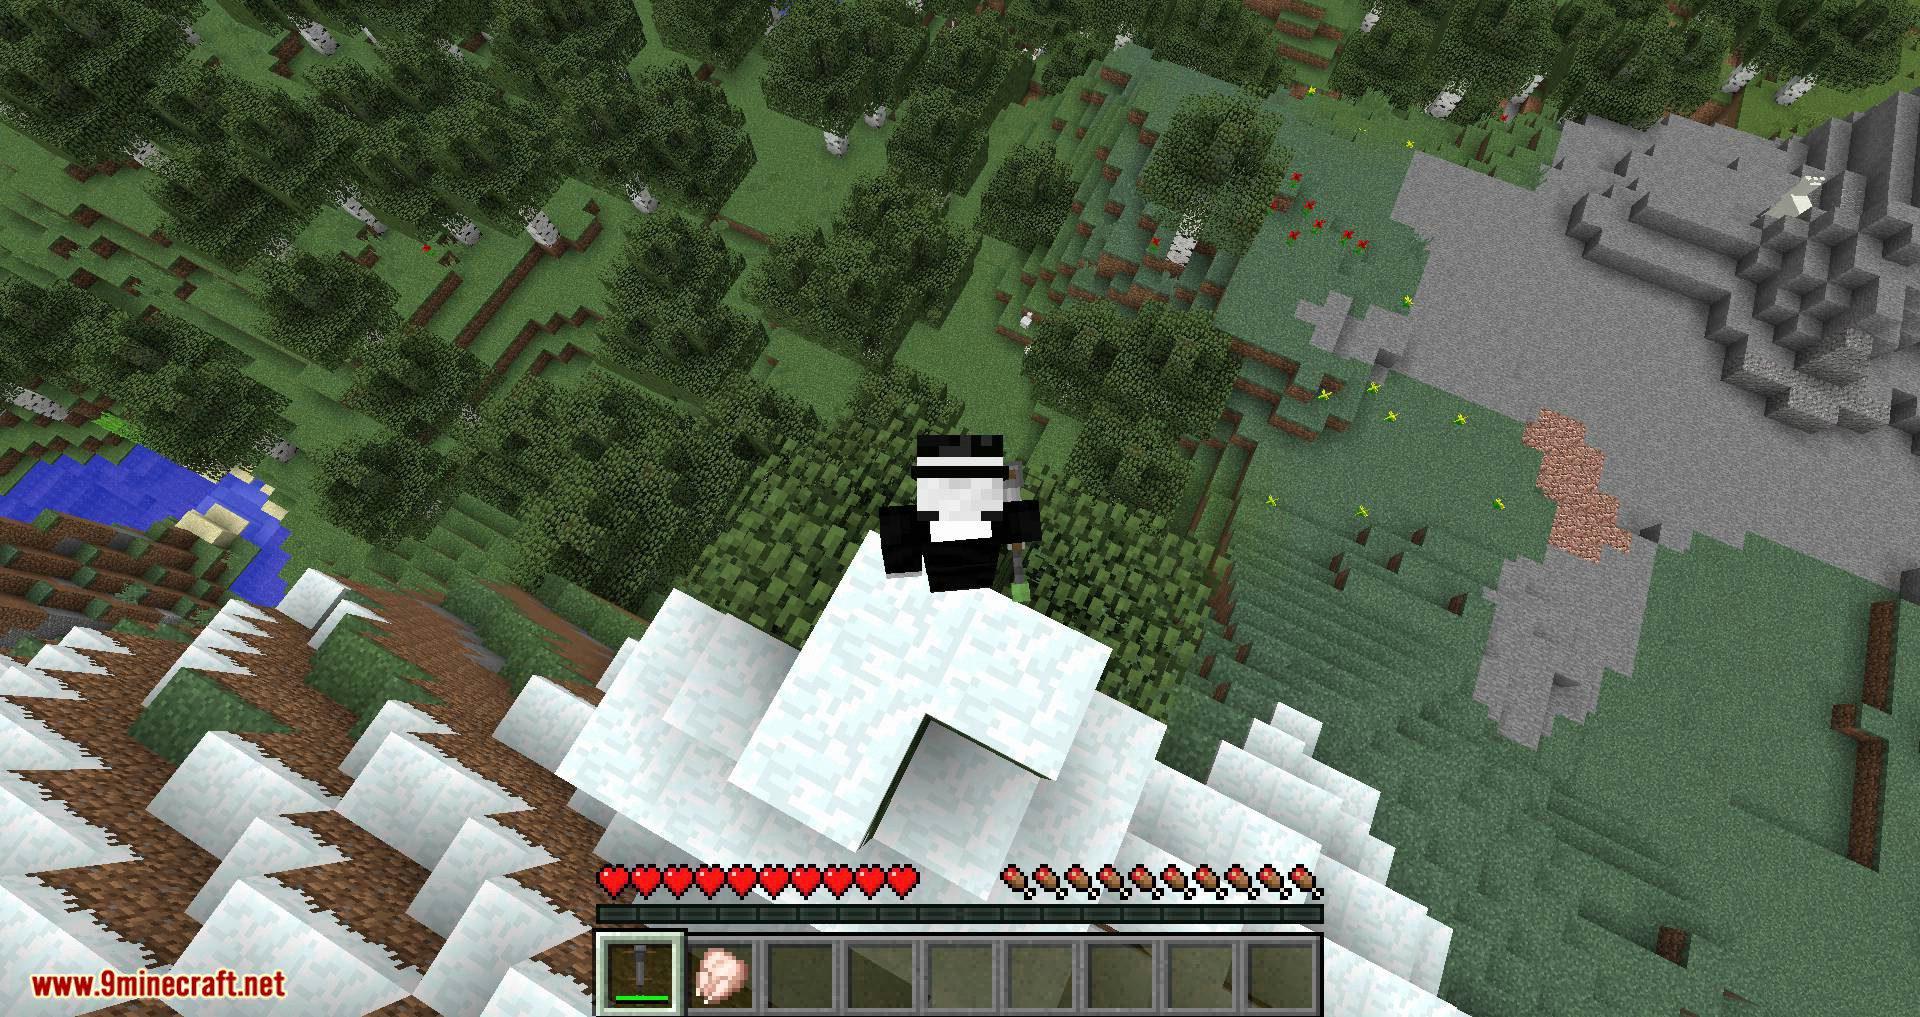 Pogo Sticks mod for minecraft 08